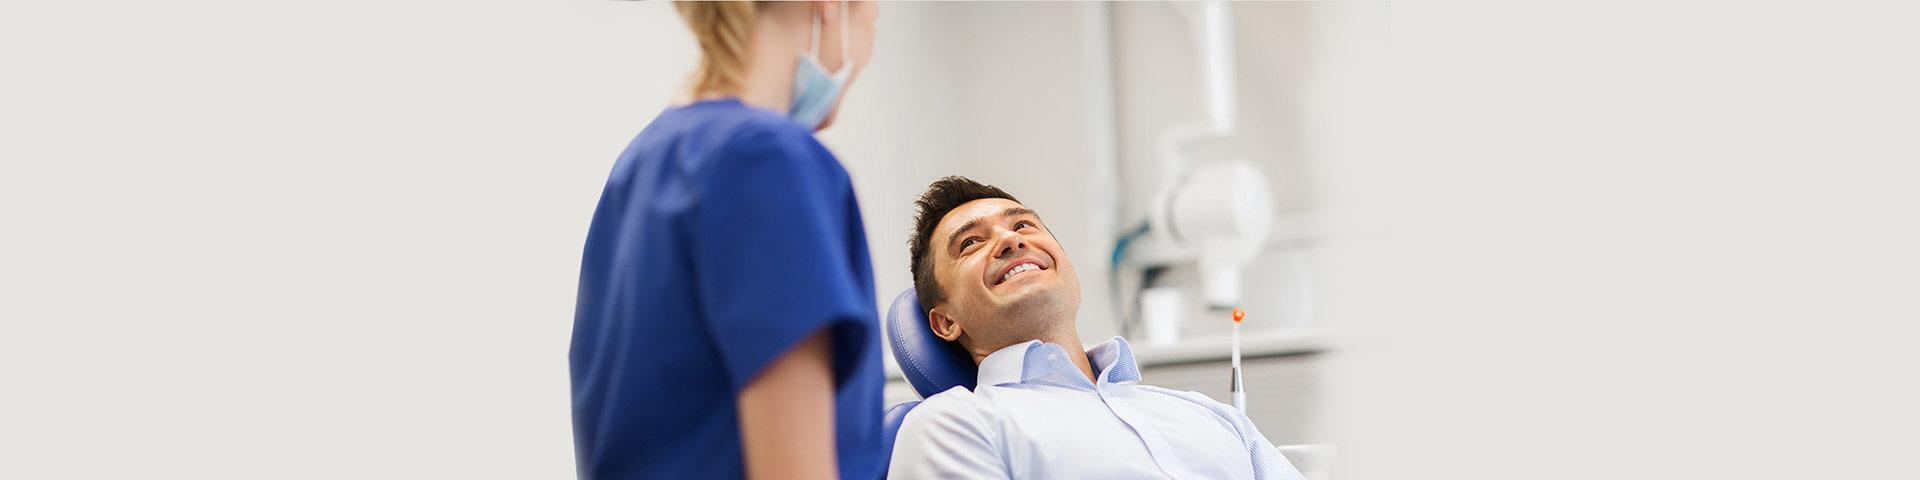 Anchorage Dental Arts dental bridge treatment